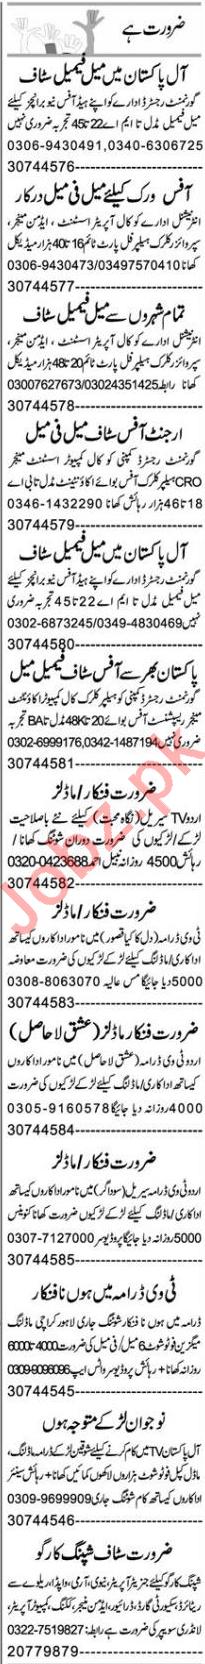 Computer Operator & Telephone Operator Jobs 2020 in Multan